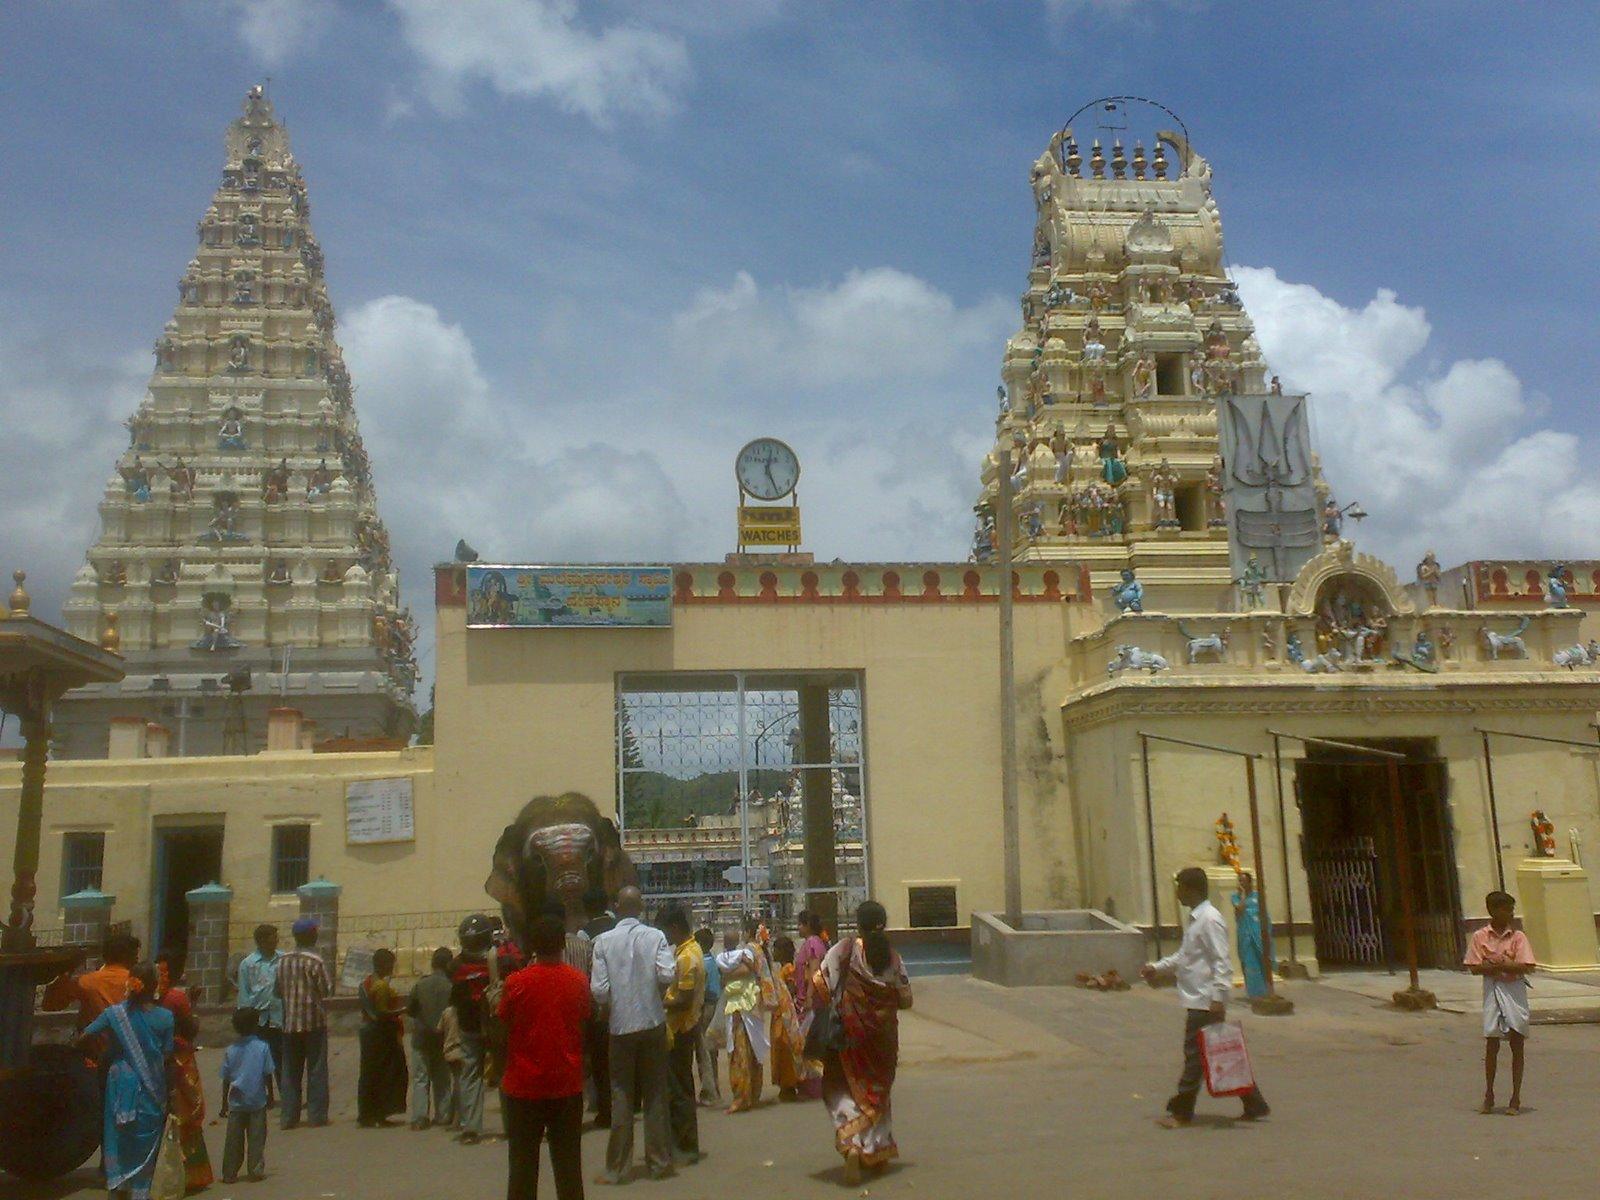 Male Mahadeshwara Betta or MM Hills Temple